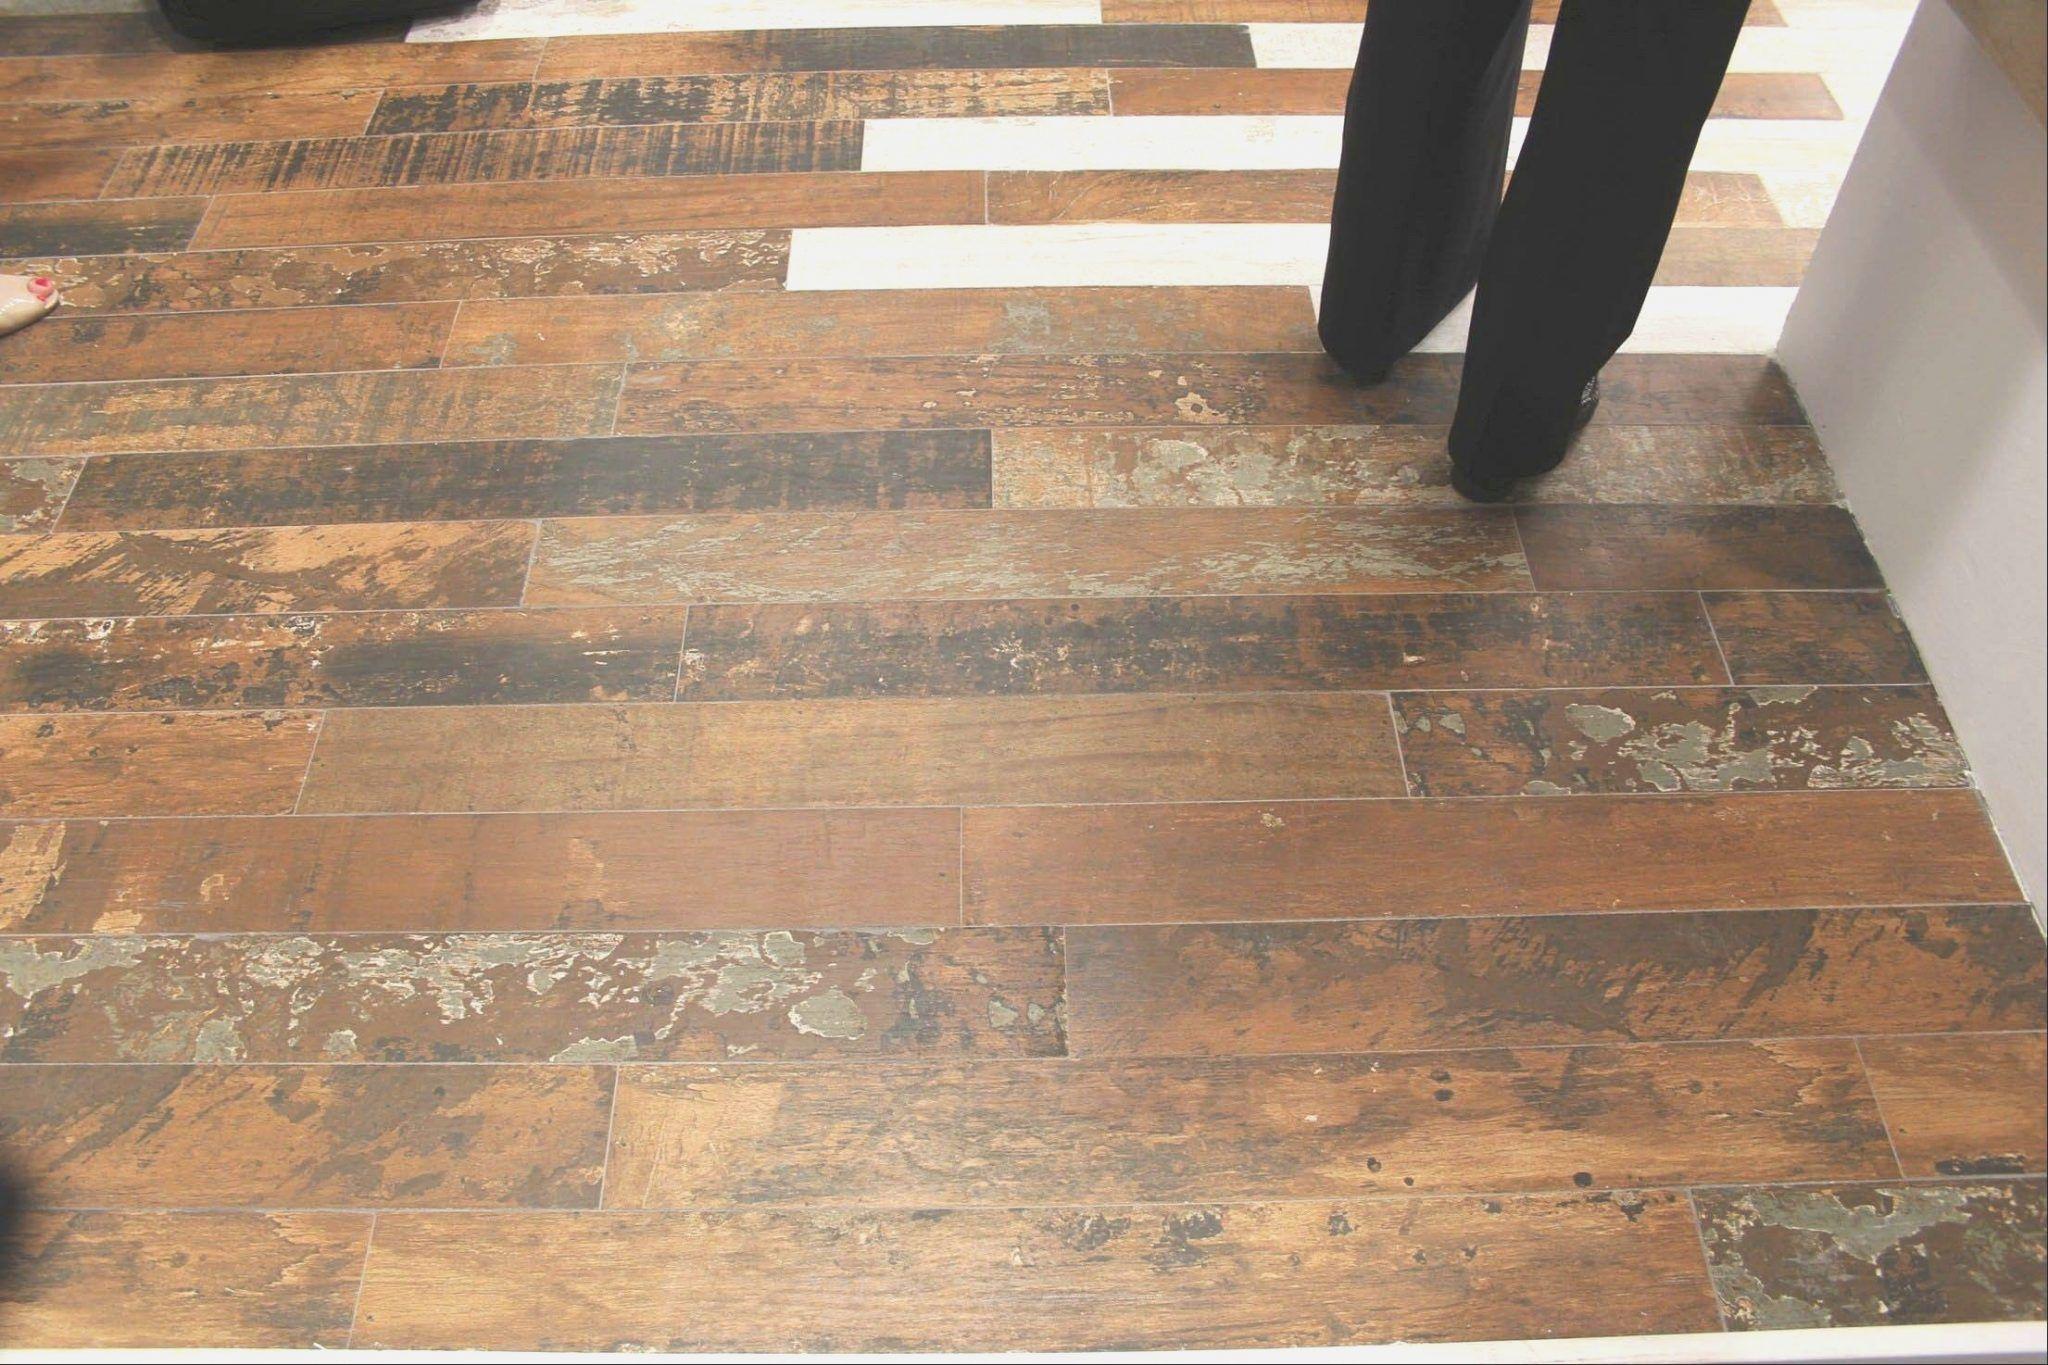 Home Depot Kitchen Floor Tile - home depot floor tiles for kitchen ...